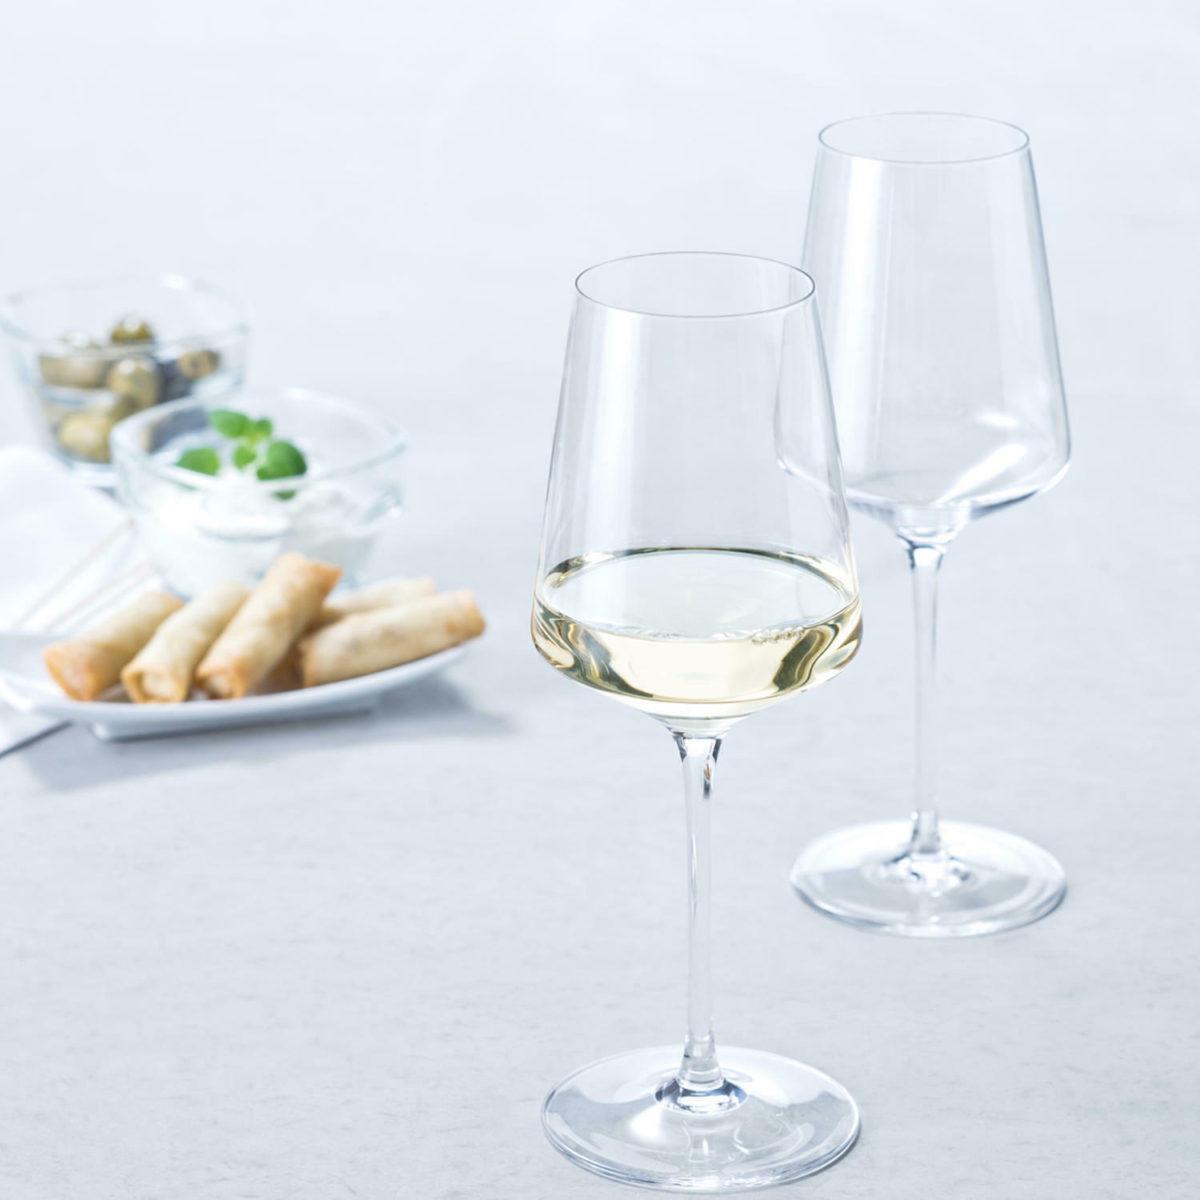 s l1600 1 8 1200x1200 - Pahar pentru vin alb Puccini 400 ml (L069540)